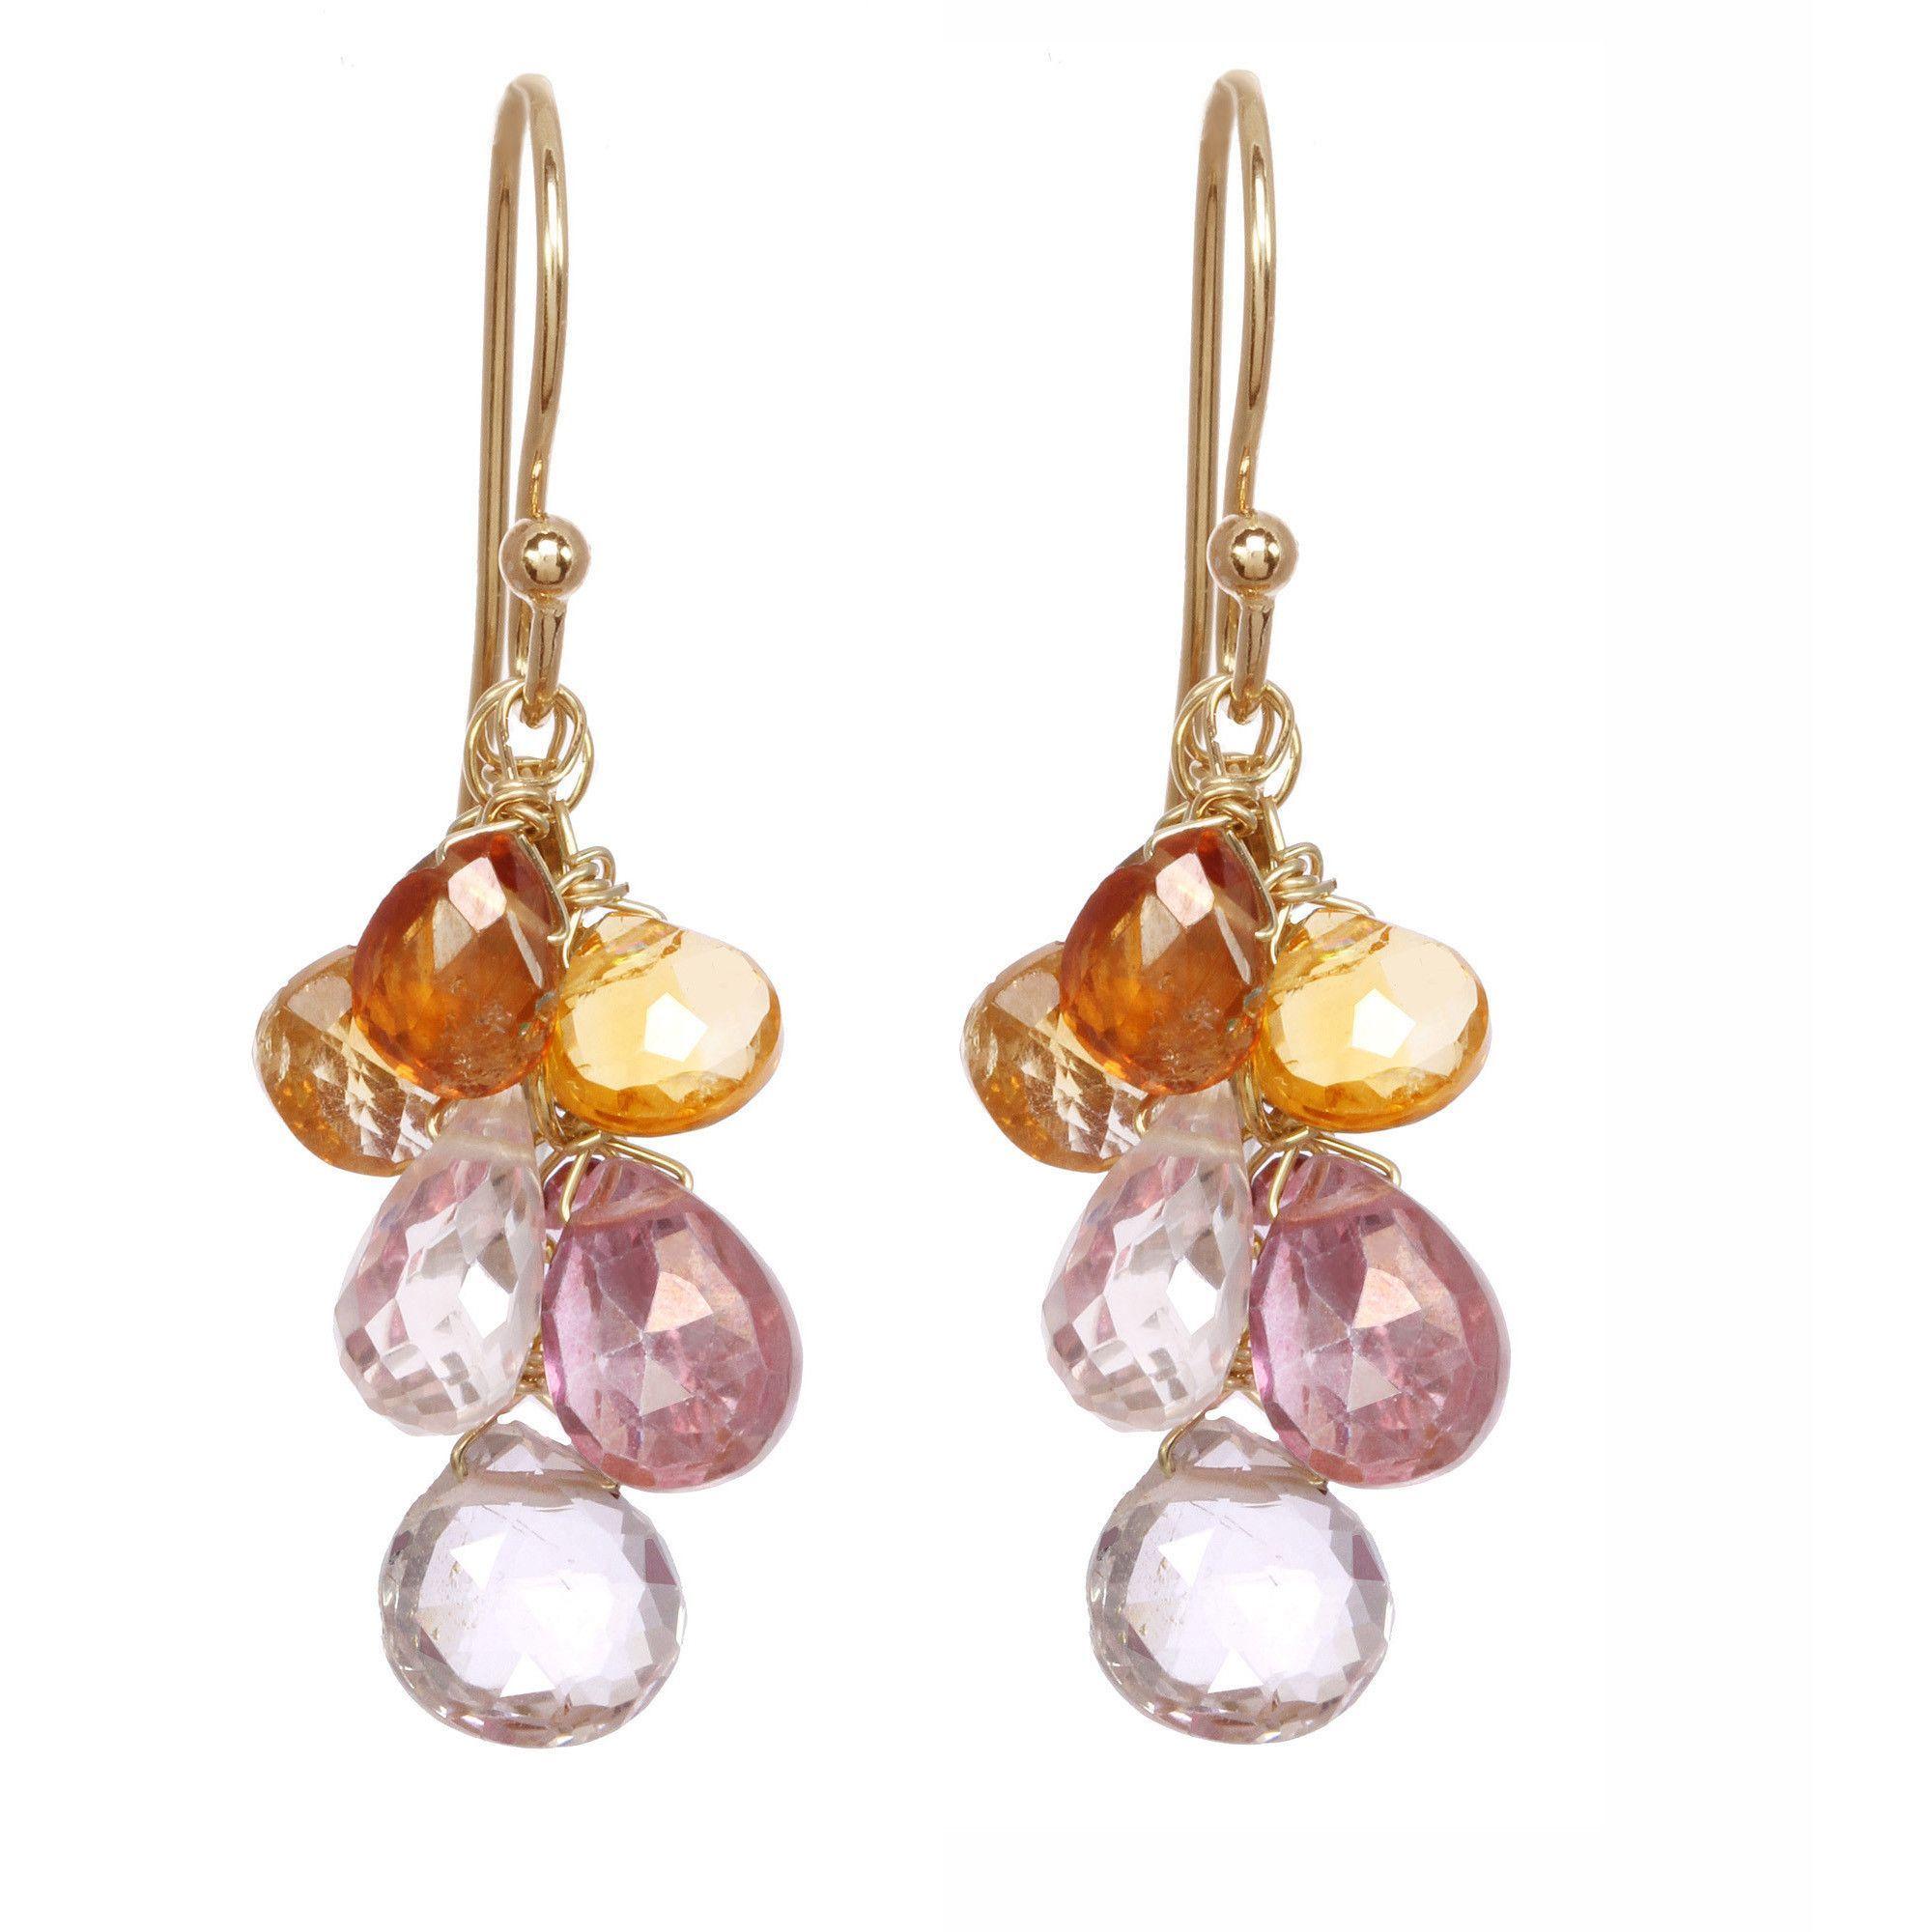 Michelle Pressler Earrings Pink Quartz and Carnelian Clusters 2506